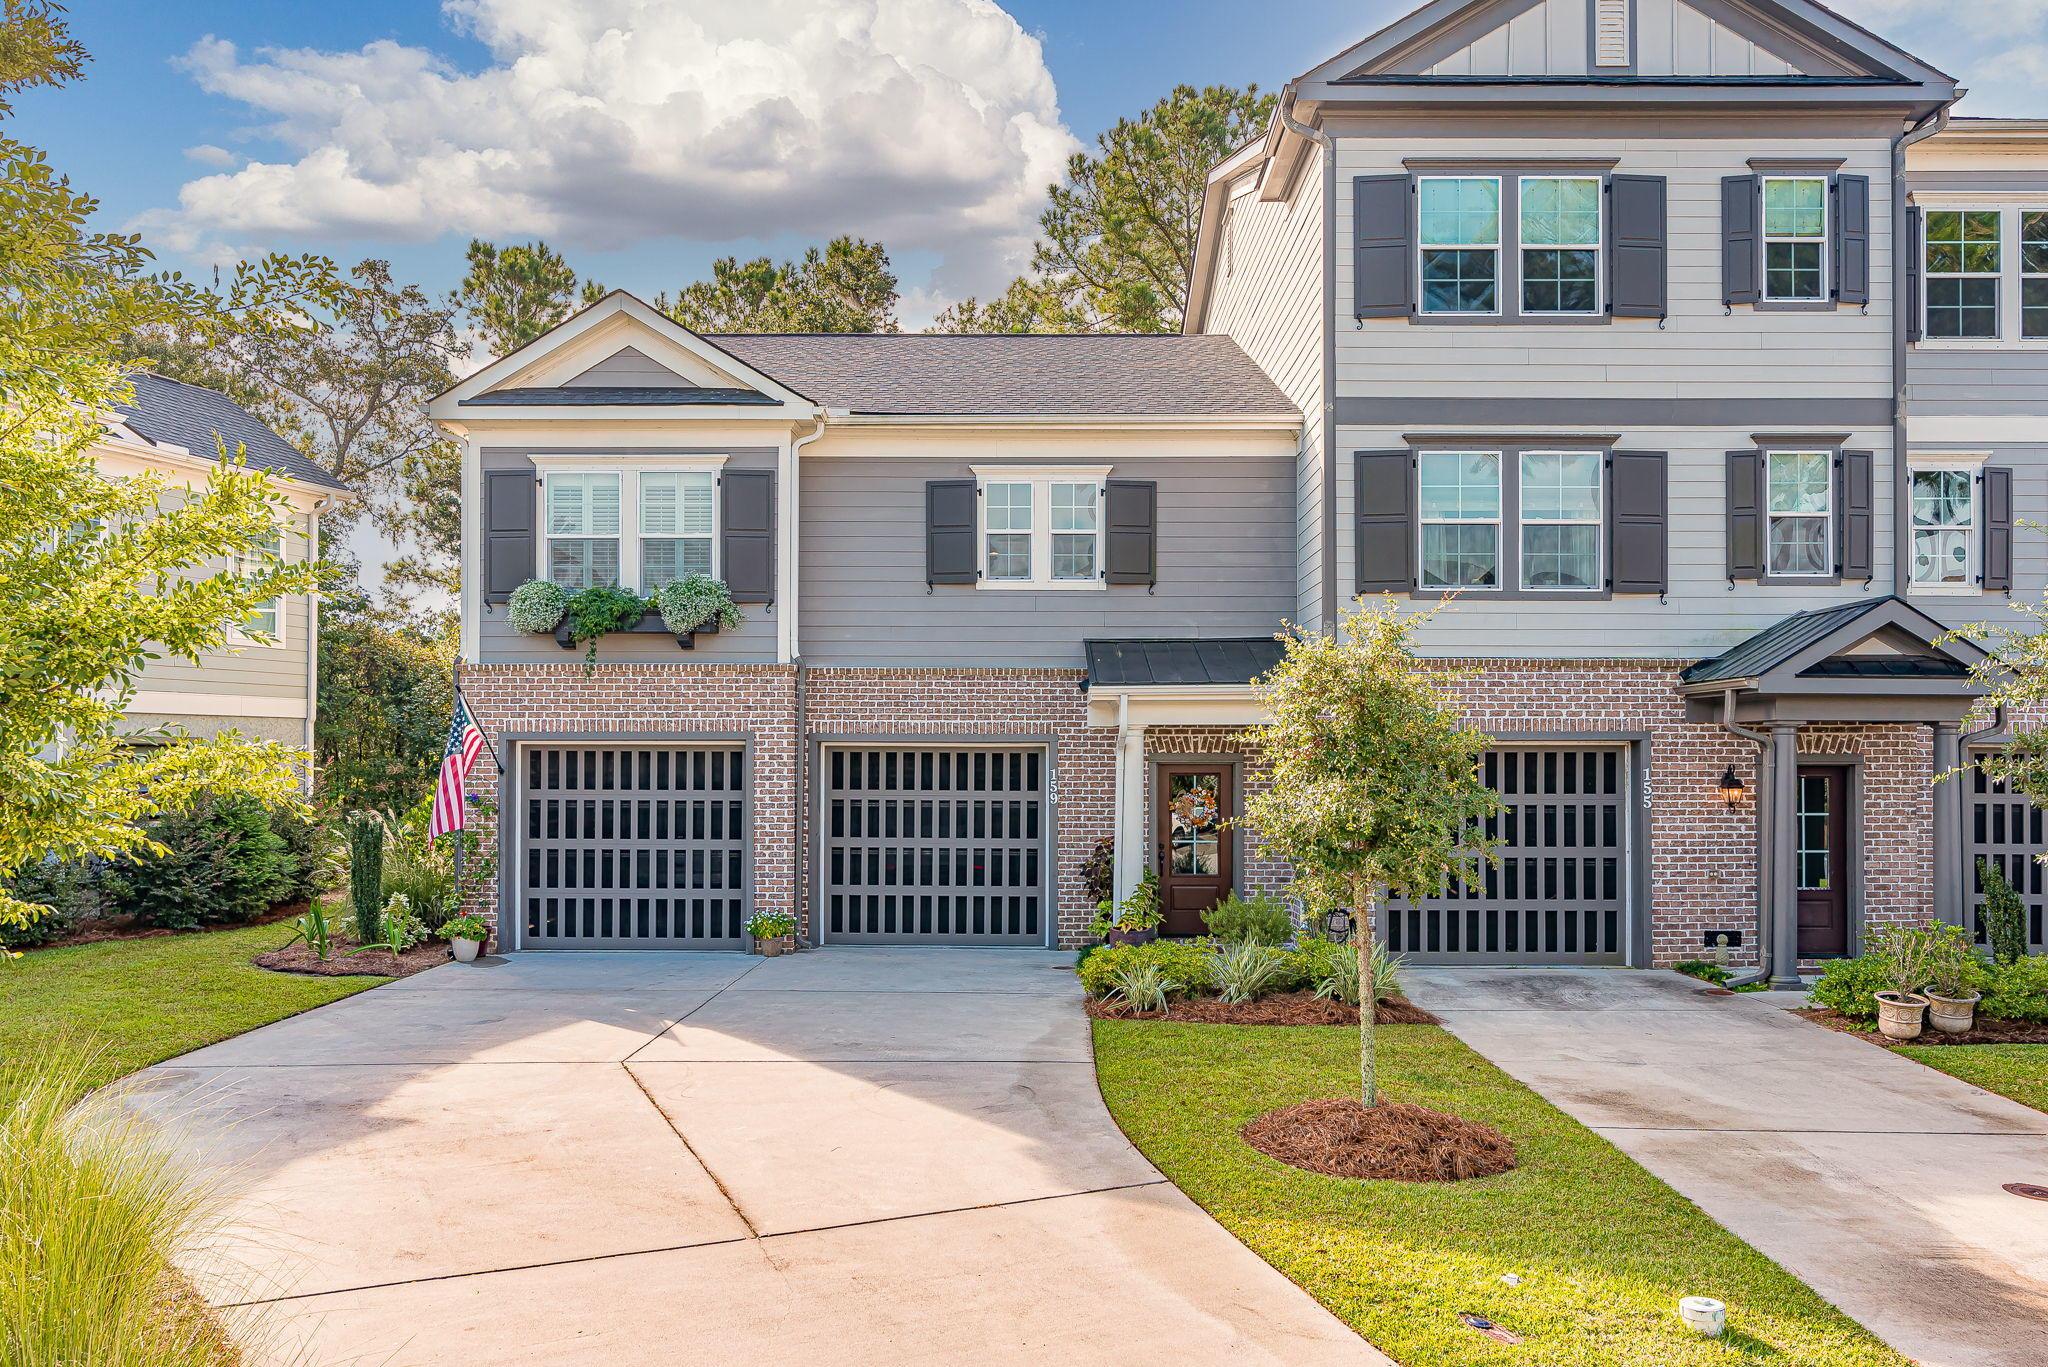 Etiwan Pointe Homes For Sale - 159 Slipper Shell, Mount Pleasant, SC - 42